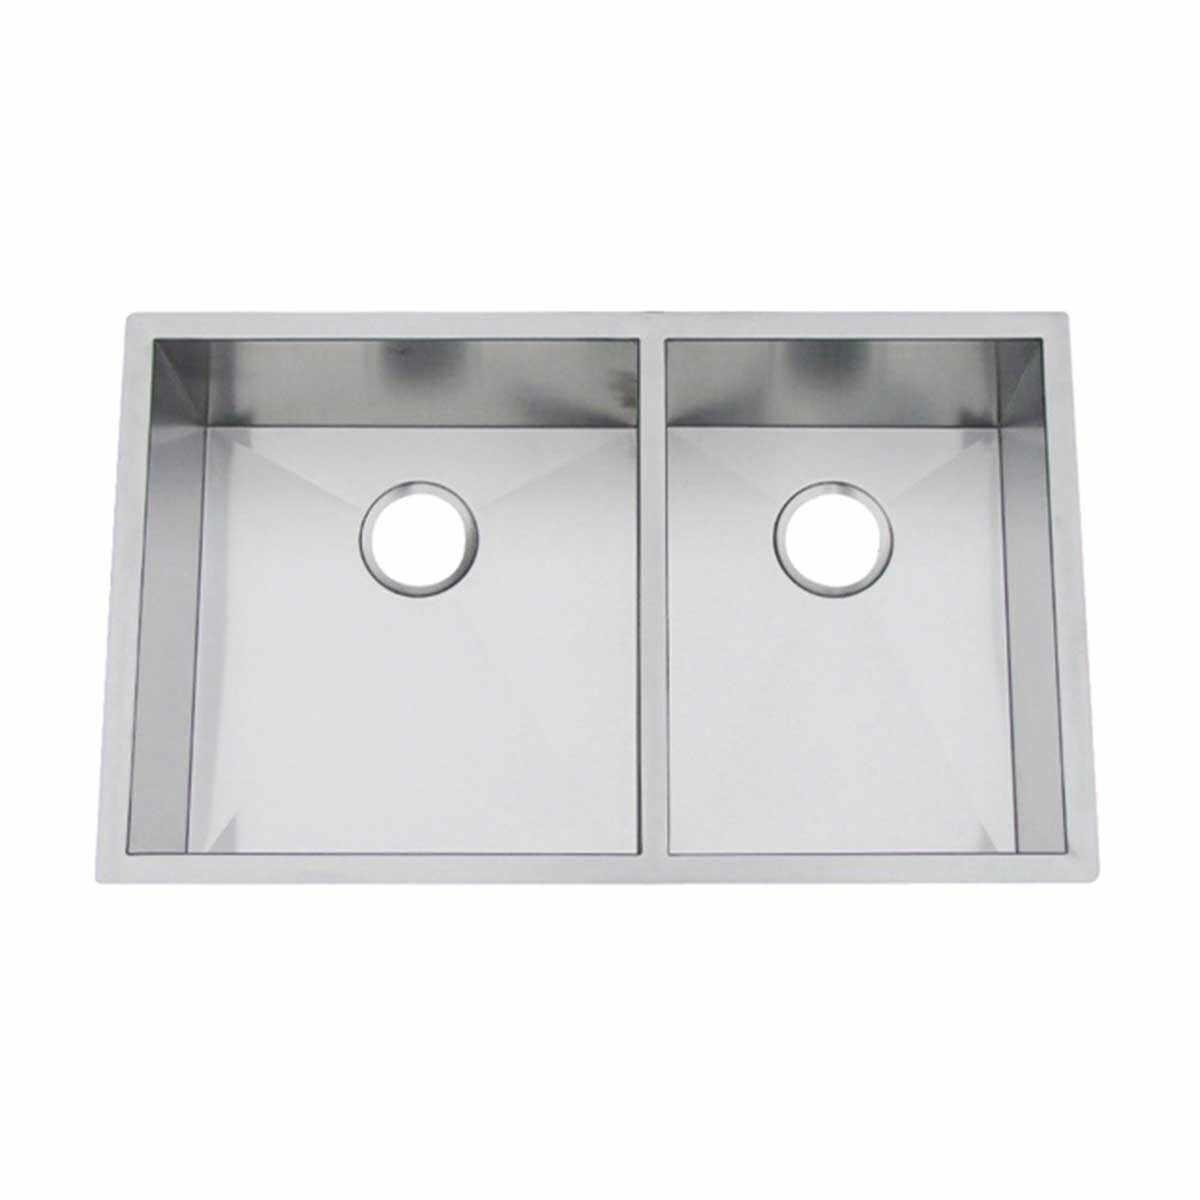 Artisan CPUZ3319-D1010 Chef Pro Double Bowl Undermount Sink